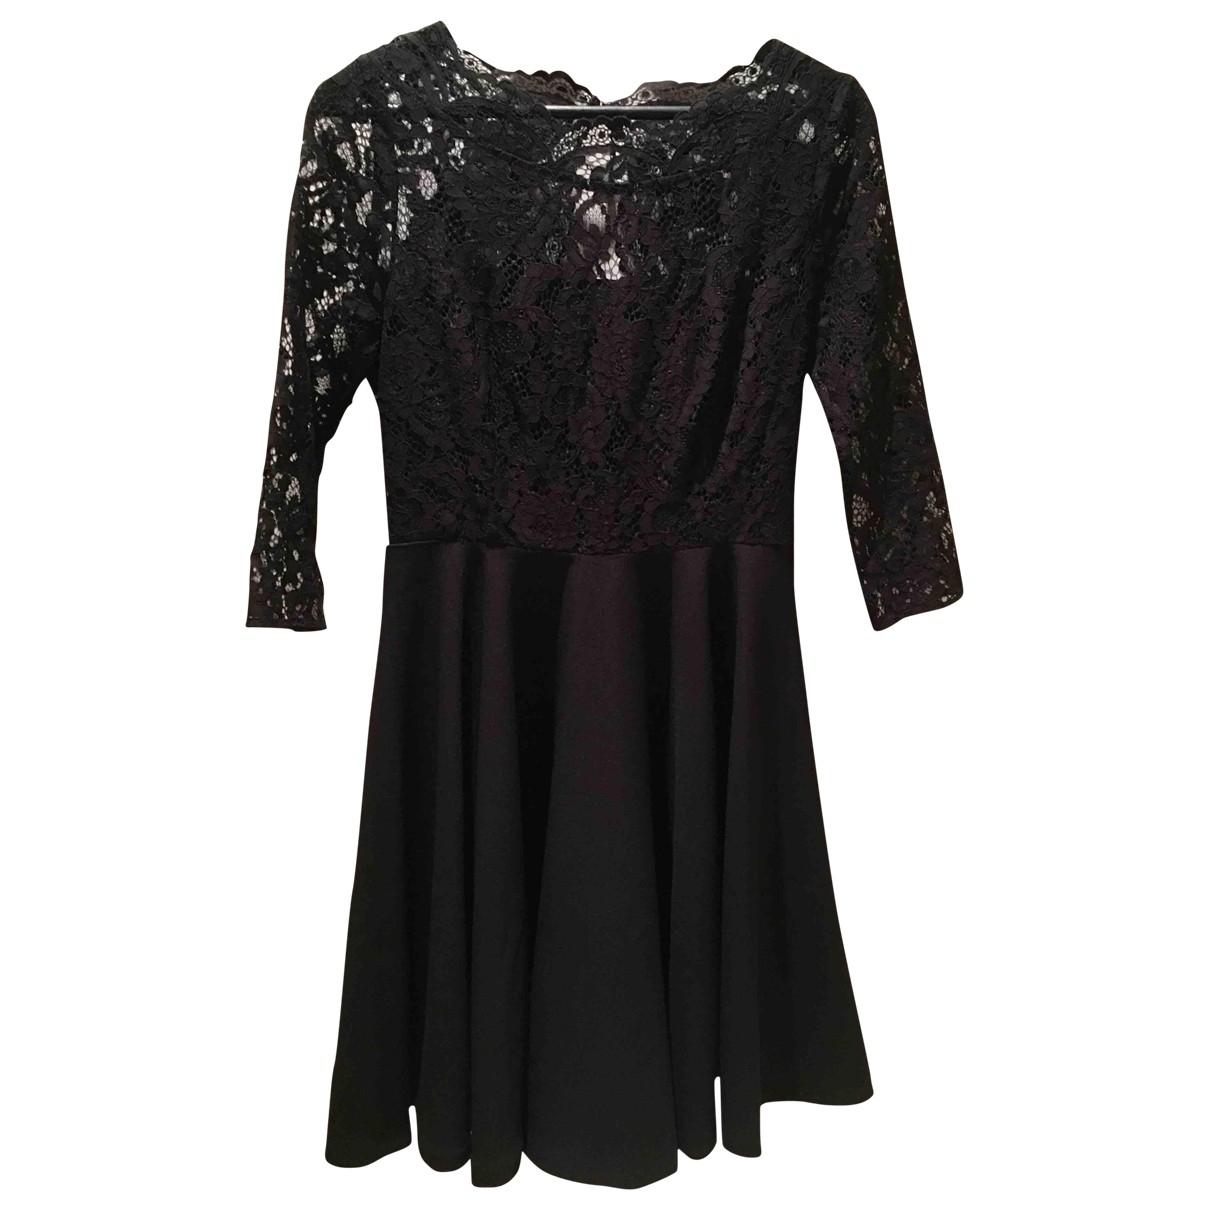 Claudie Pierlot \N Black Lace dress for Women 38 FR